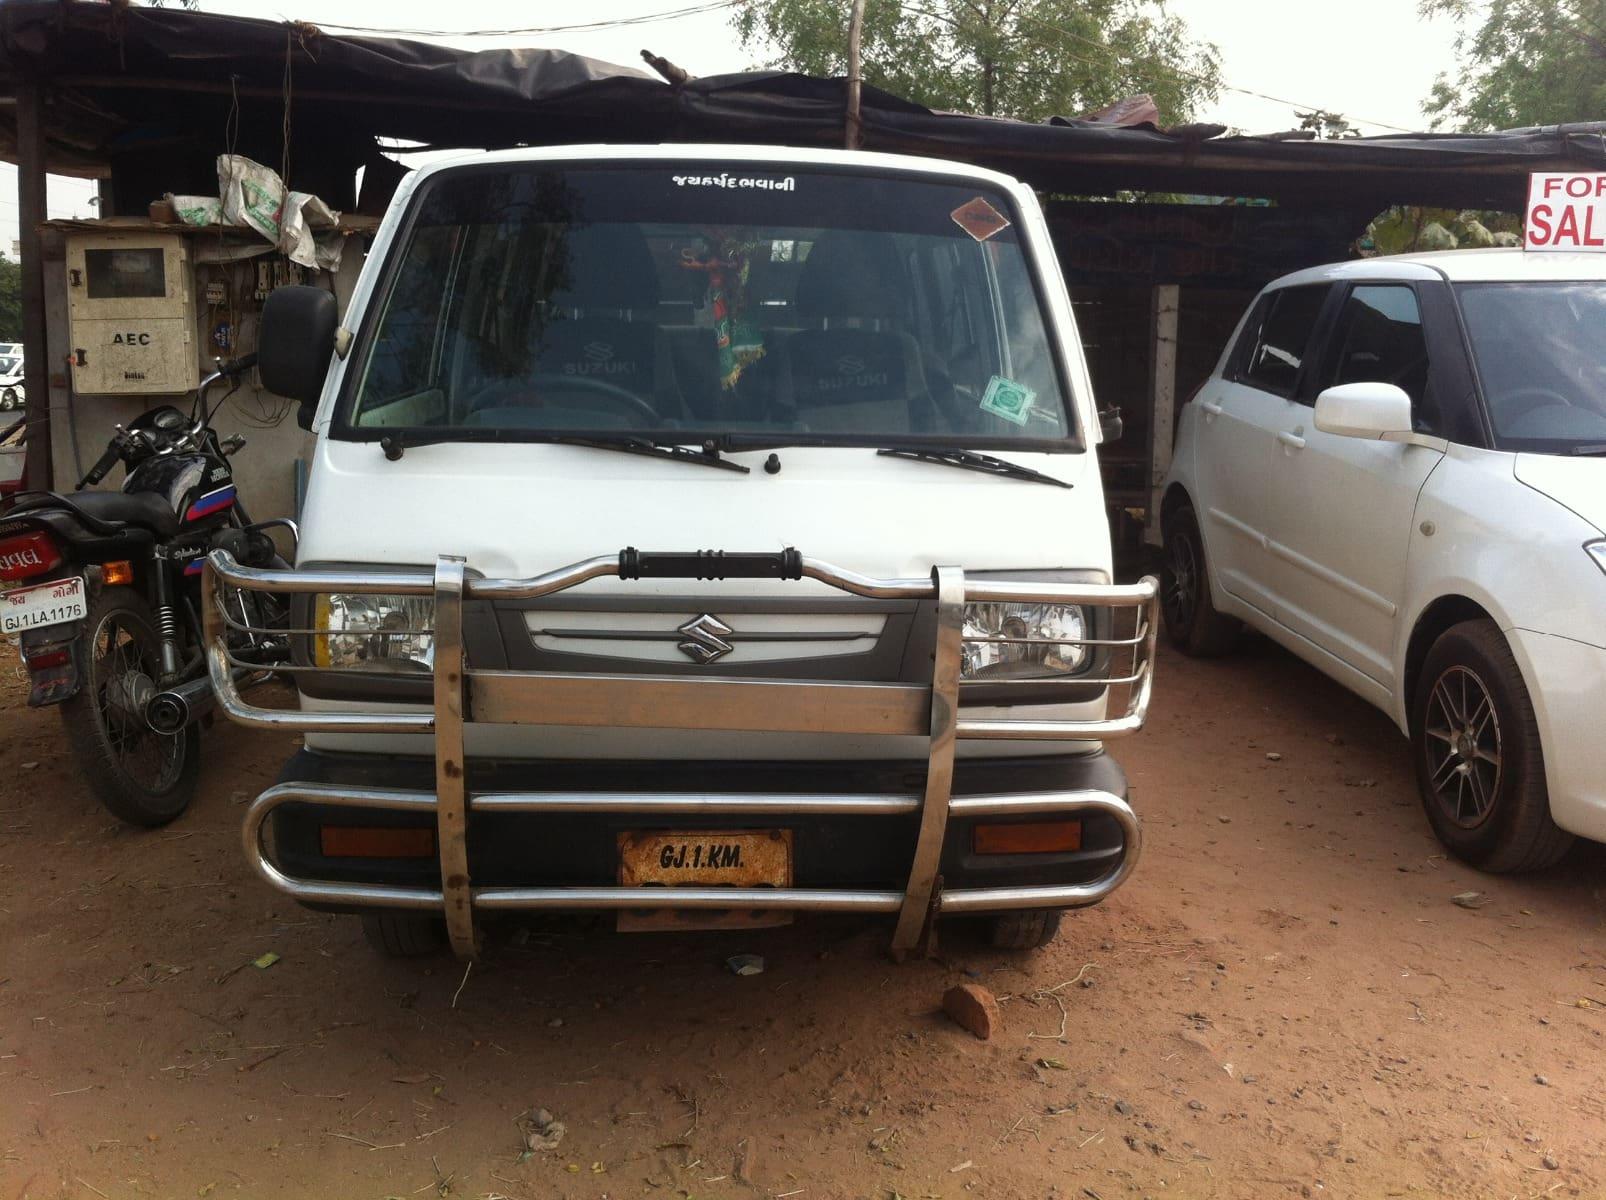 Used Maruti Omni MPI STD BSIII 8-STR W/ IMMOBILISER (Id-740318) Car in Ahmedabad